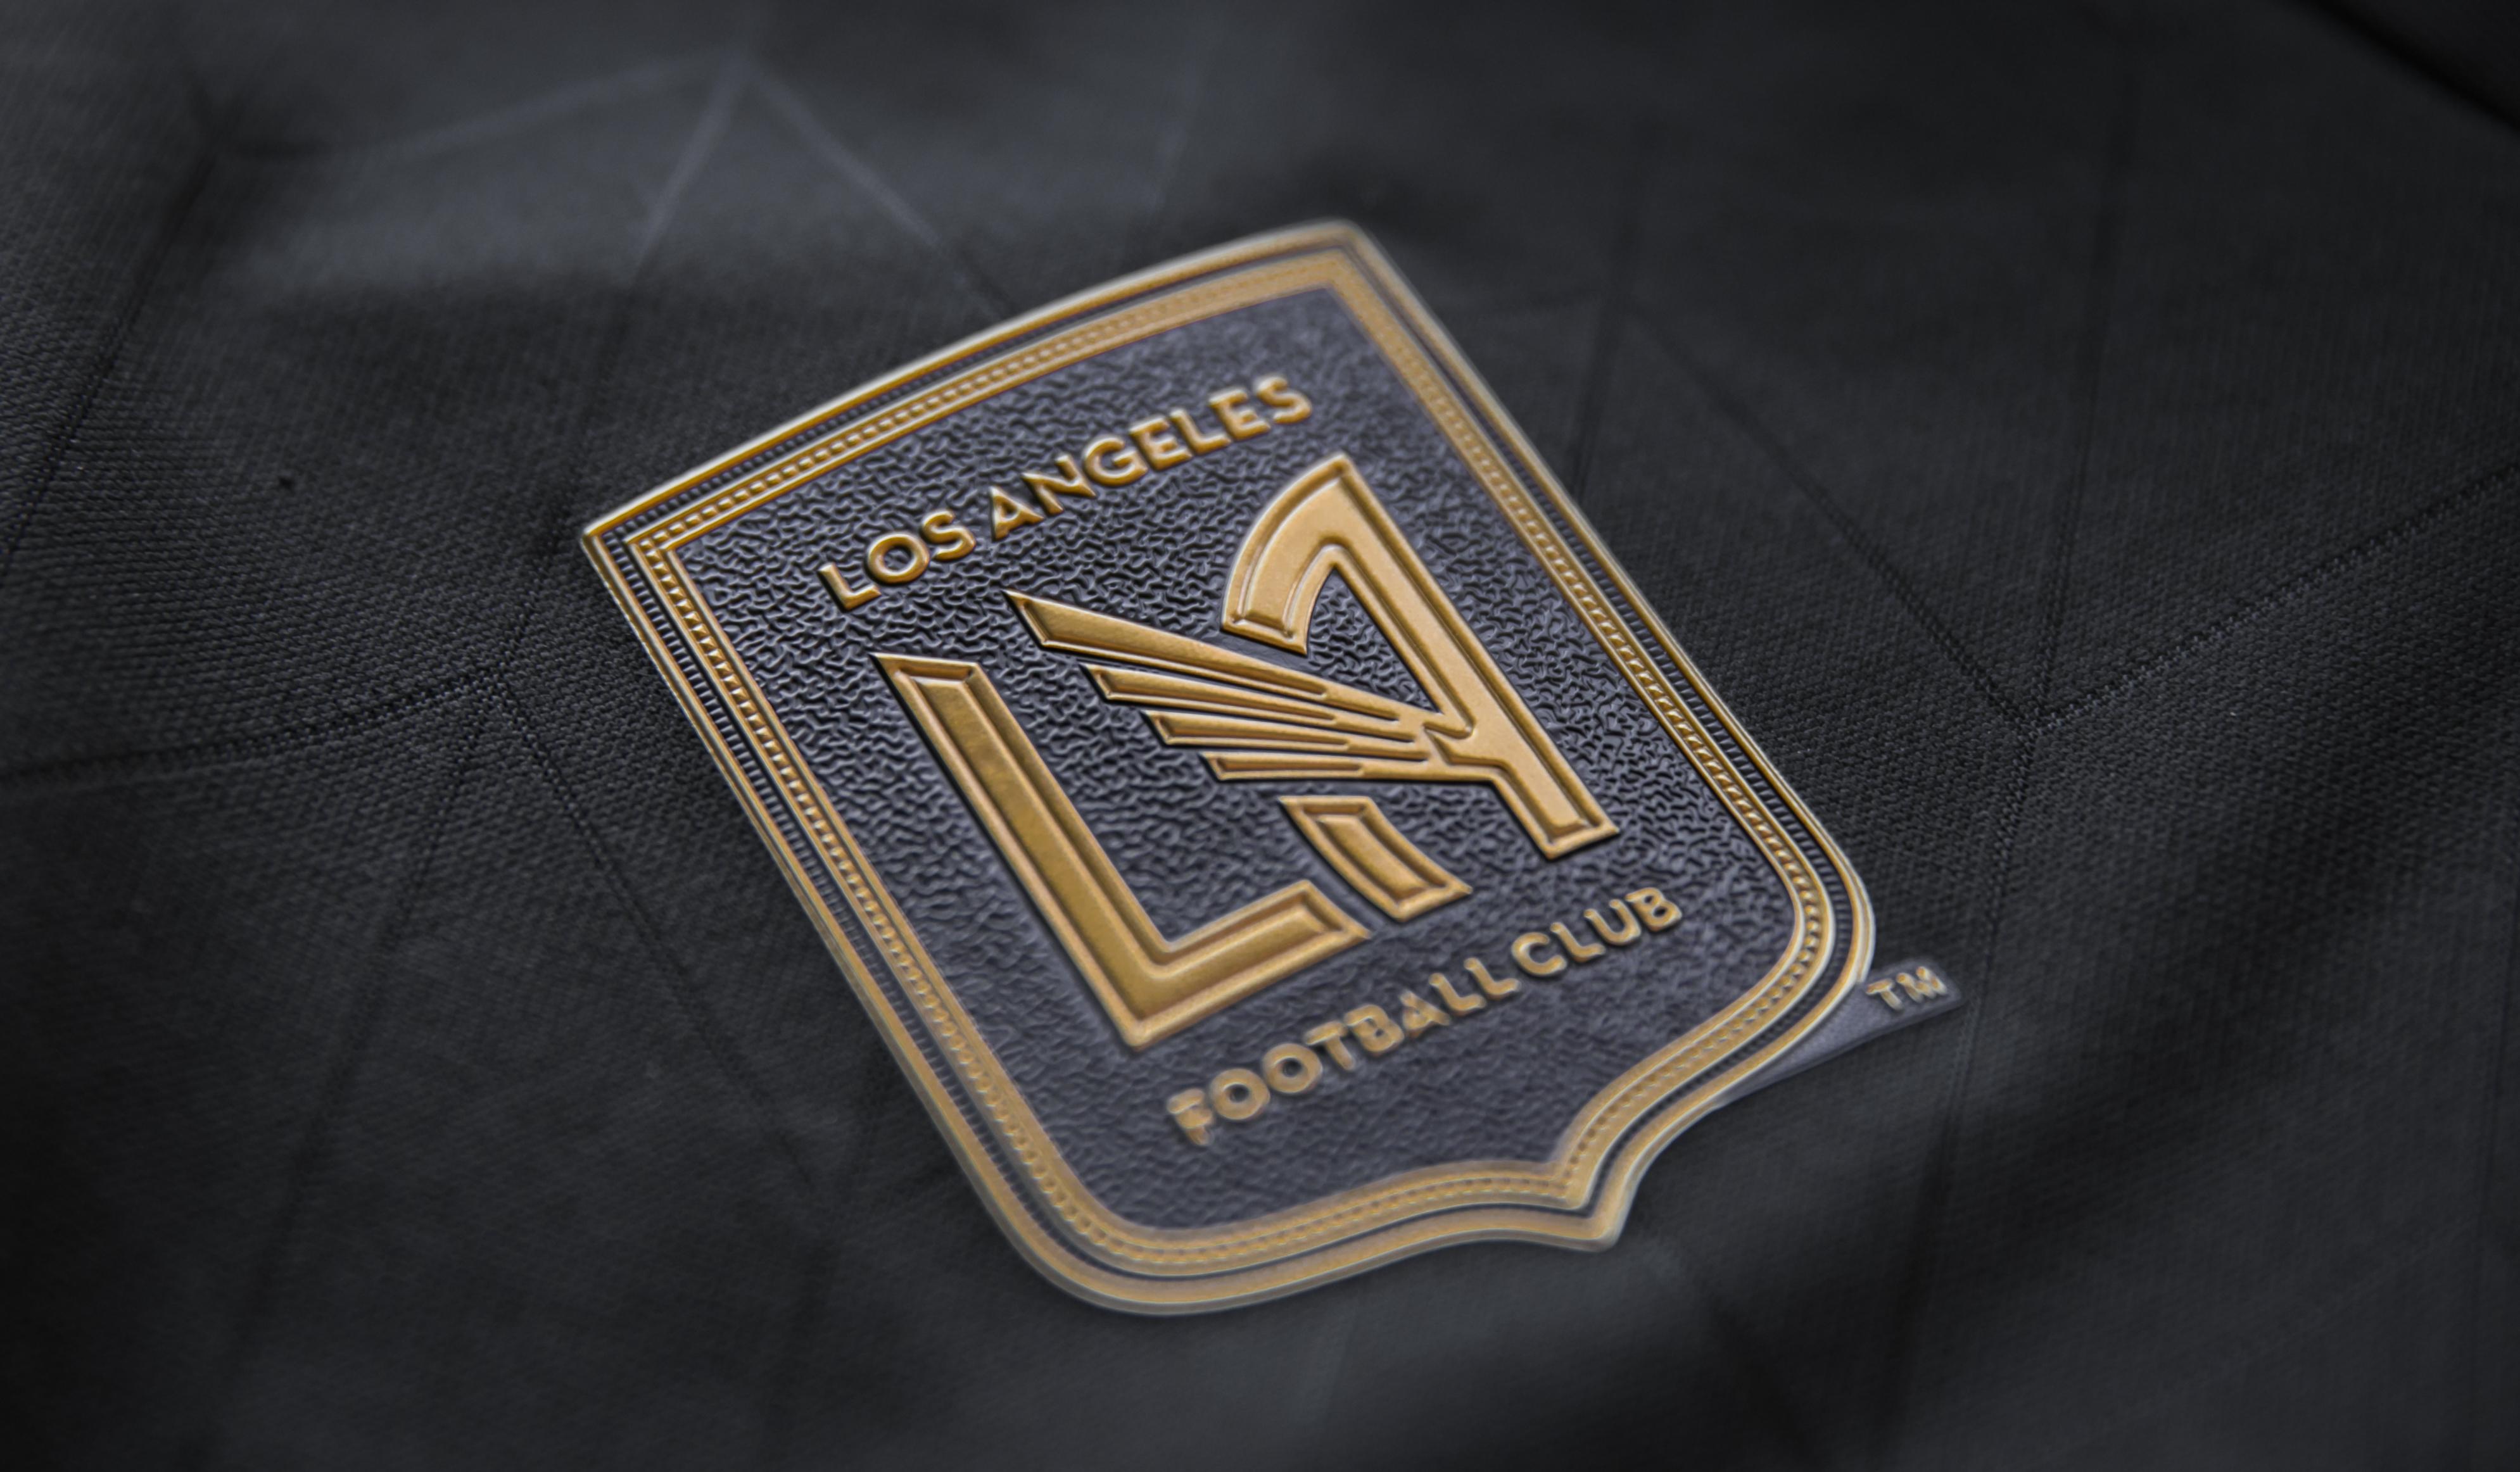 69eba4a9c Details  2018 LAFC Kit by LAFC - Los Angeles Football Club